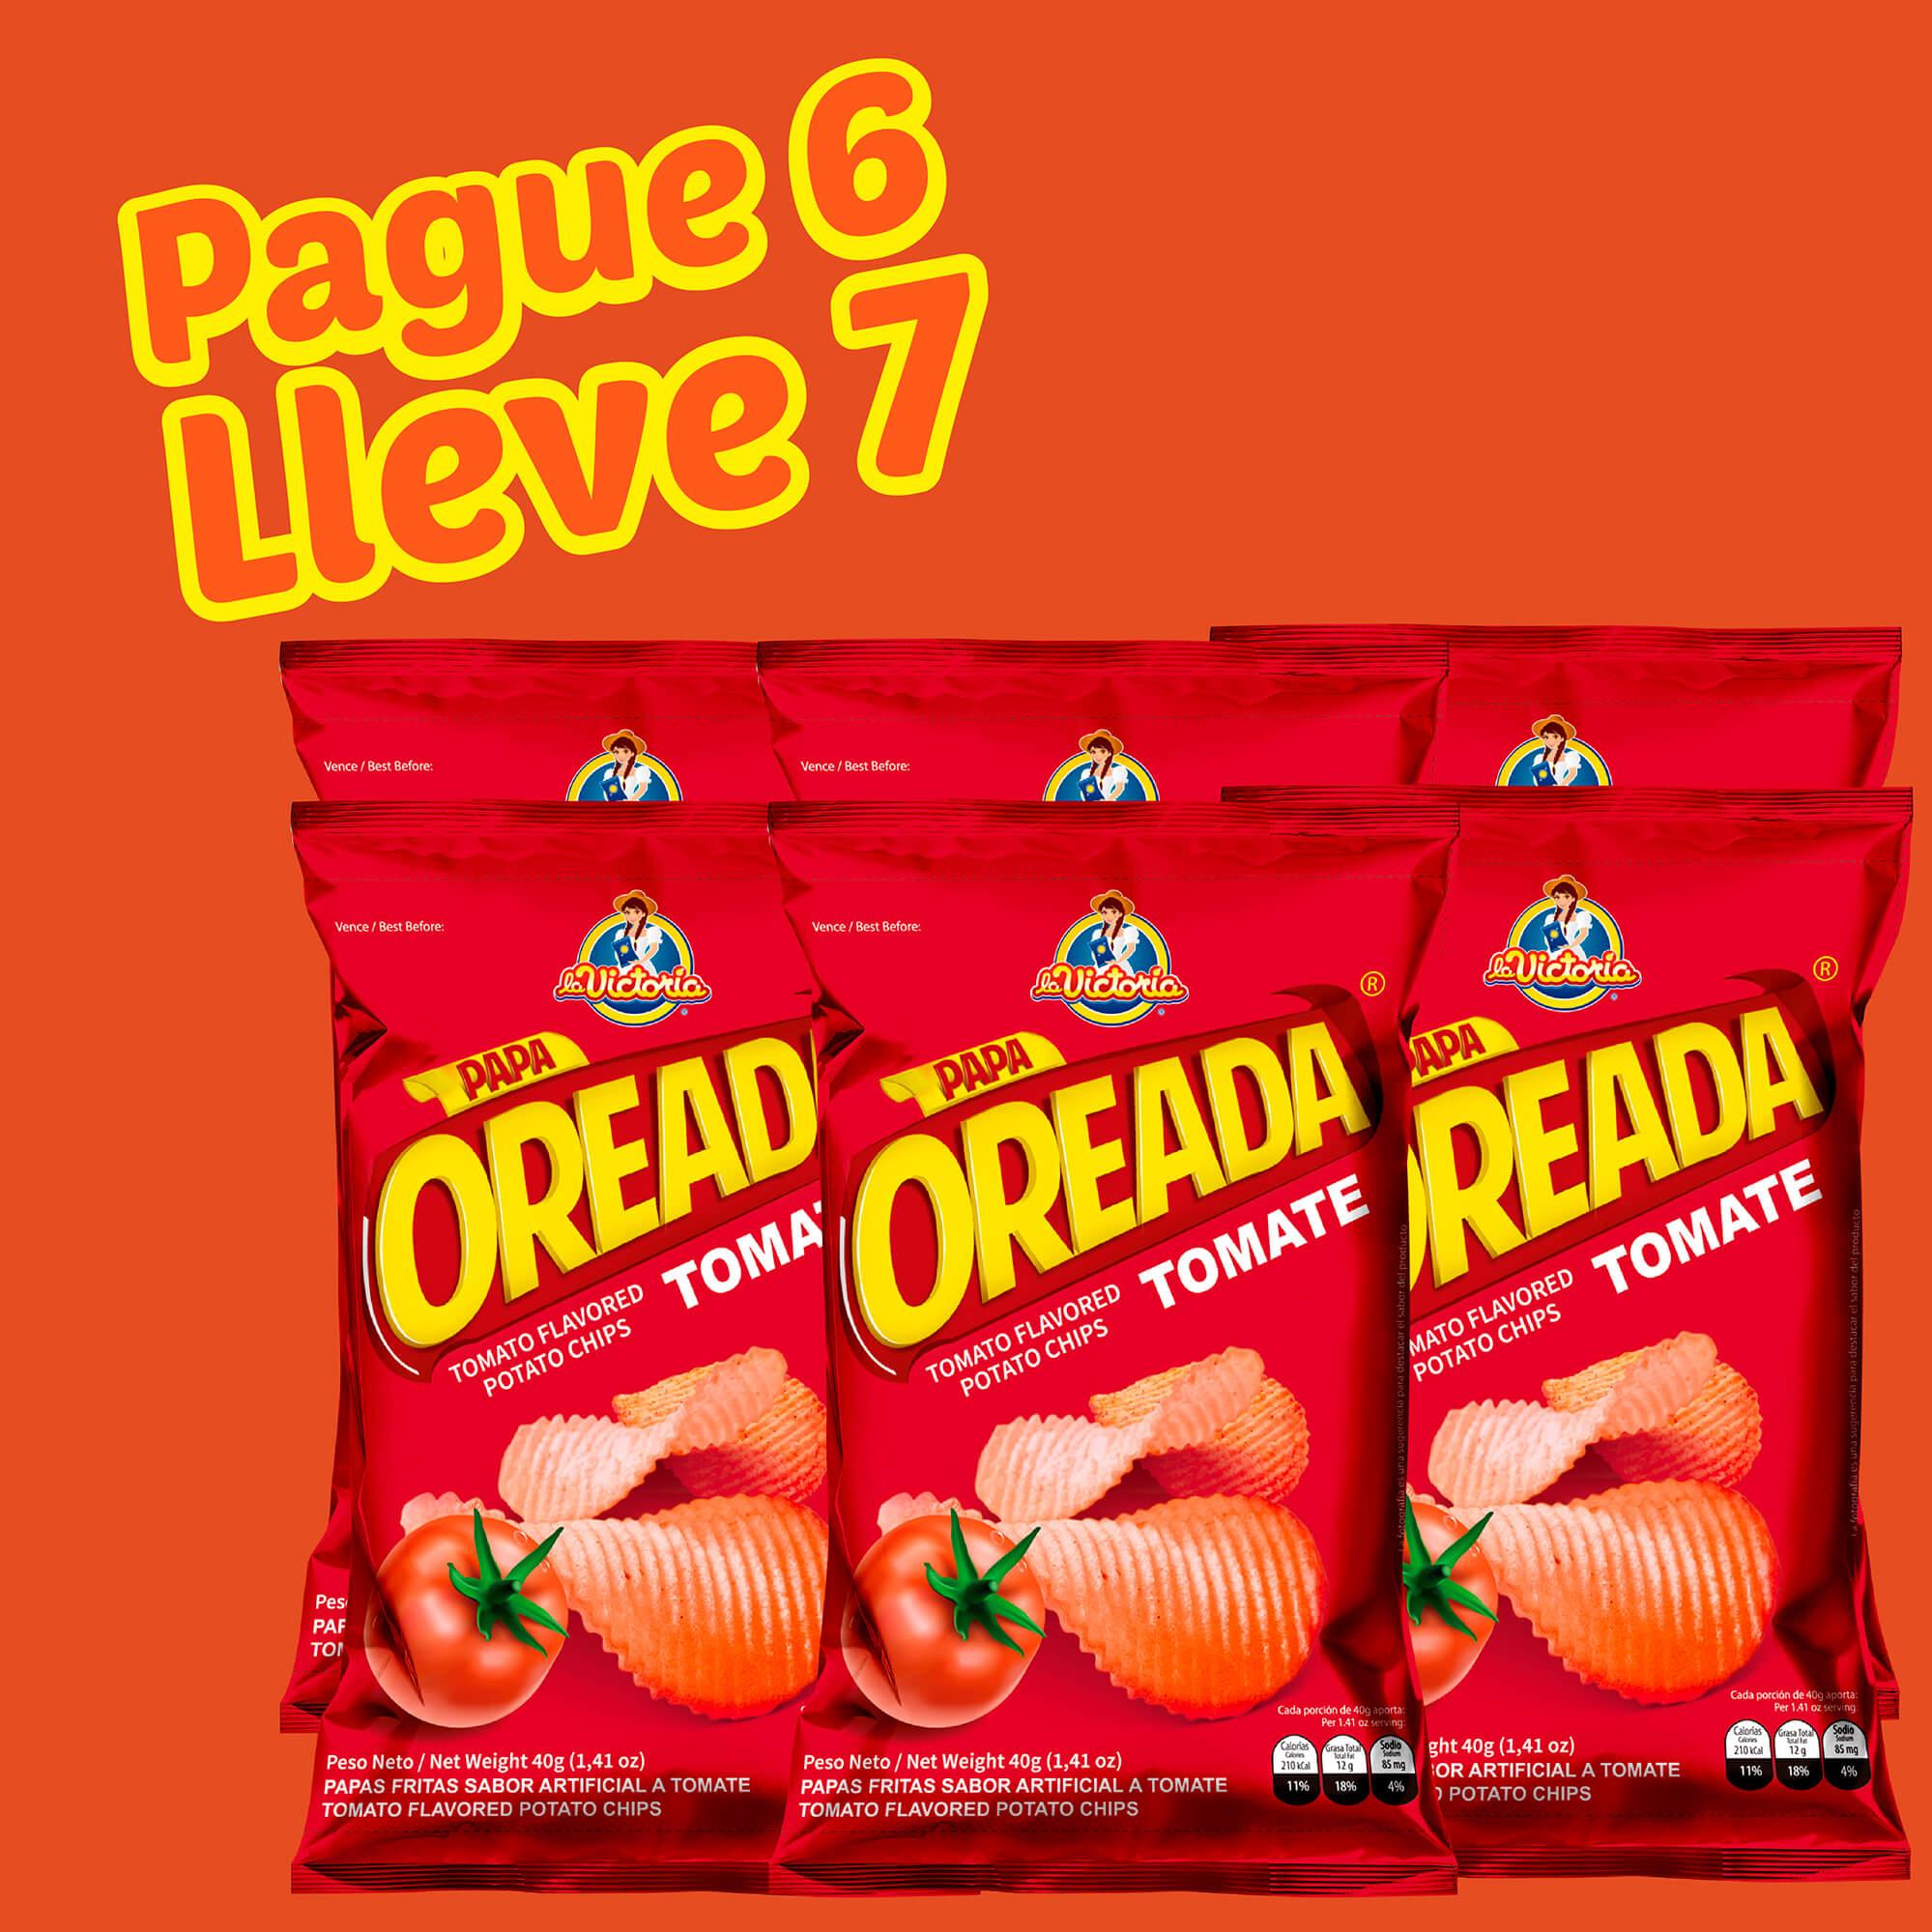 Papa Oreada Tomate 40 g (Display PAGUE 6 LLEVE 7 UND.)_2